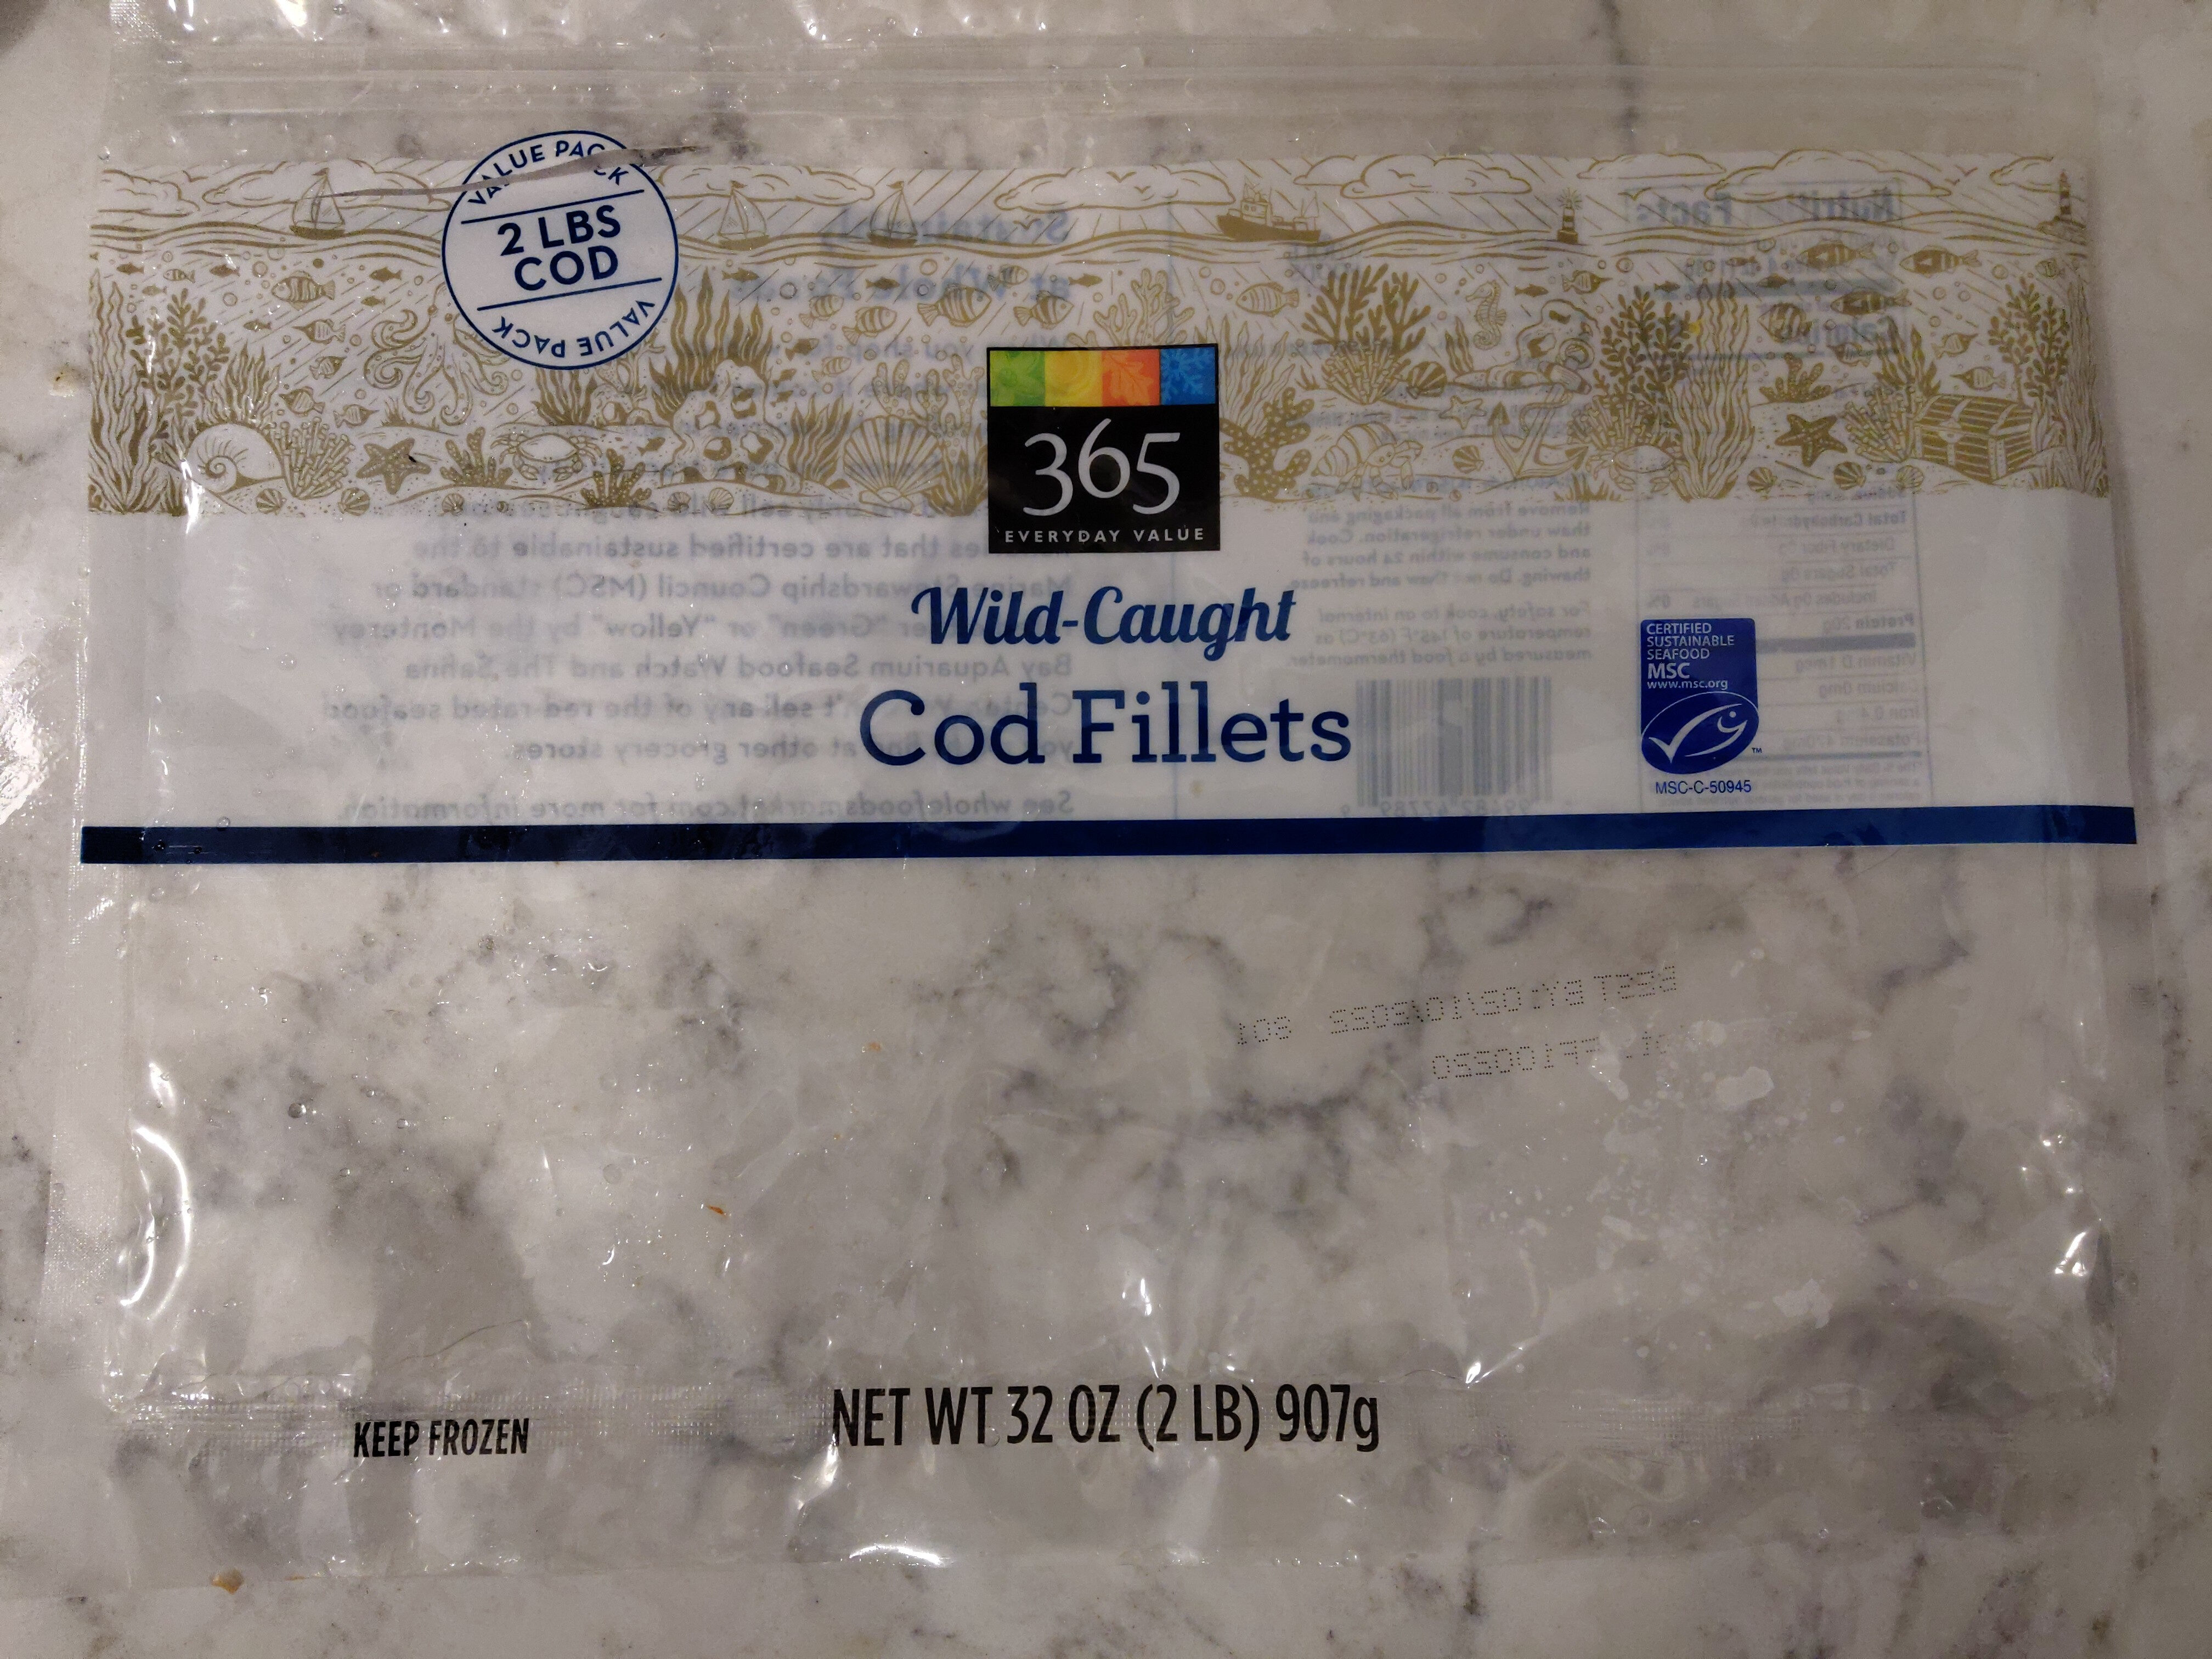 Wild-Caught Cod Fillets - Product - en